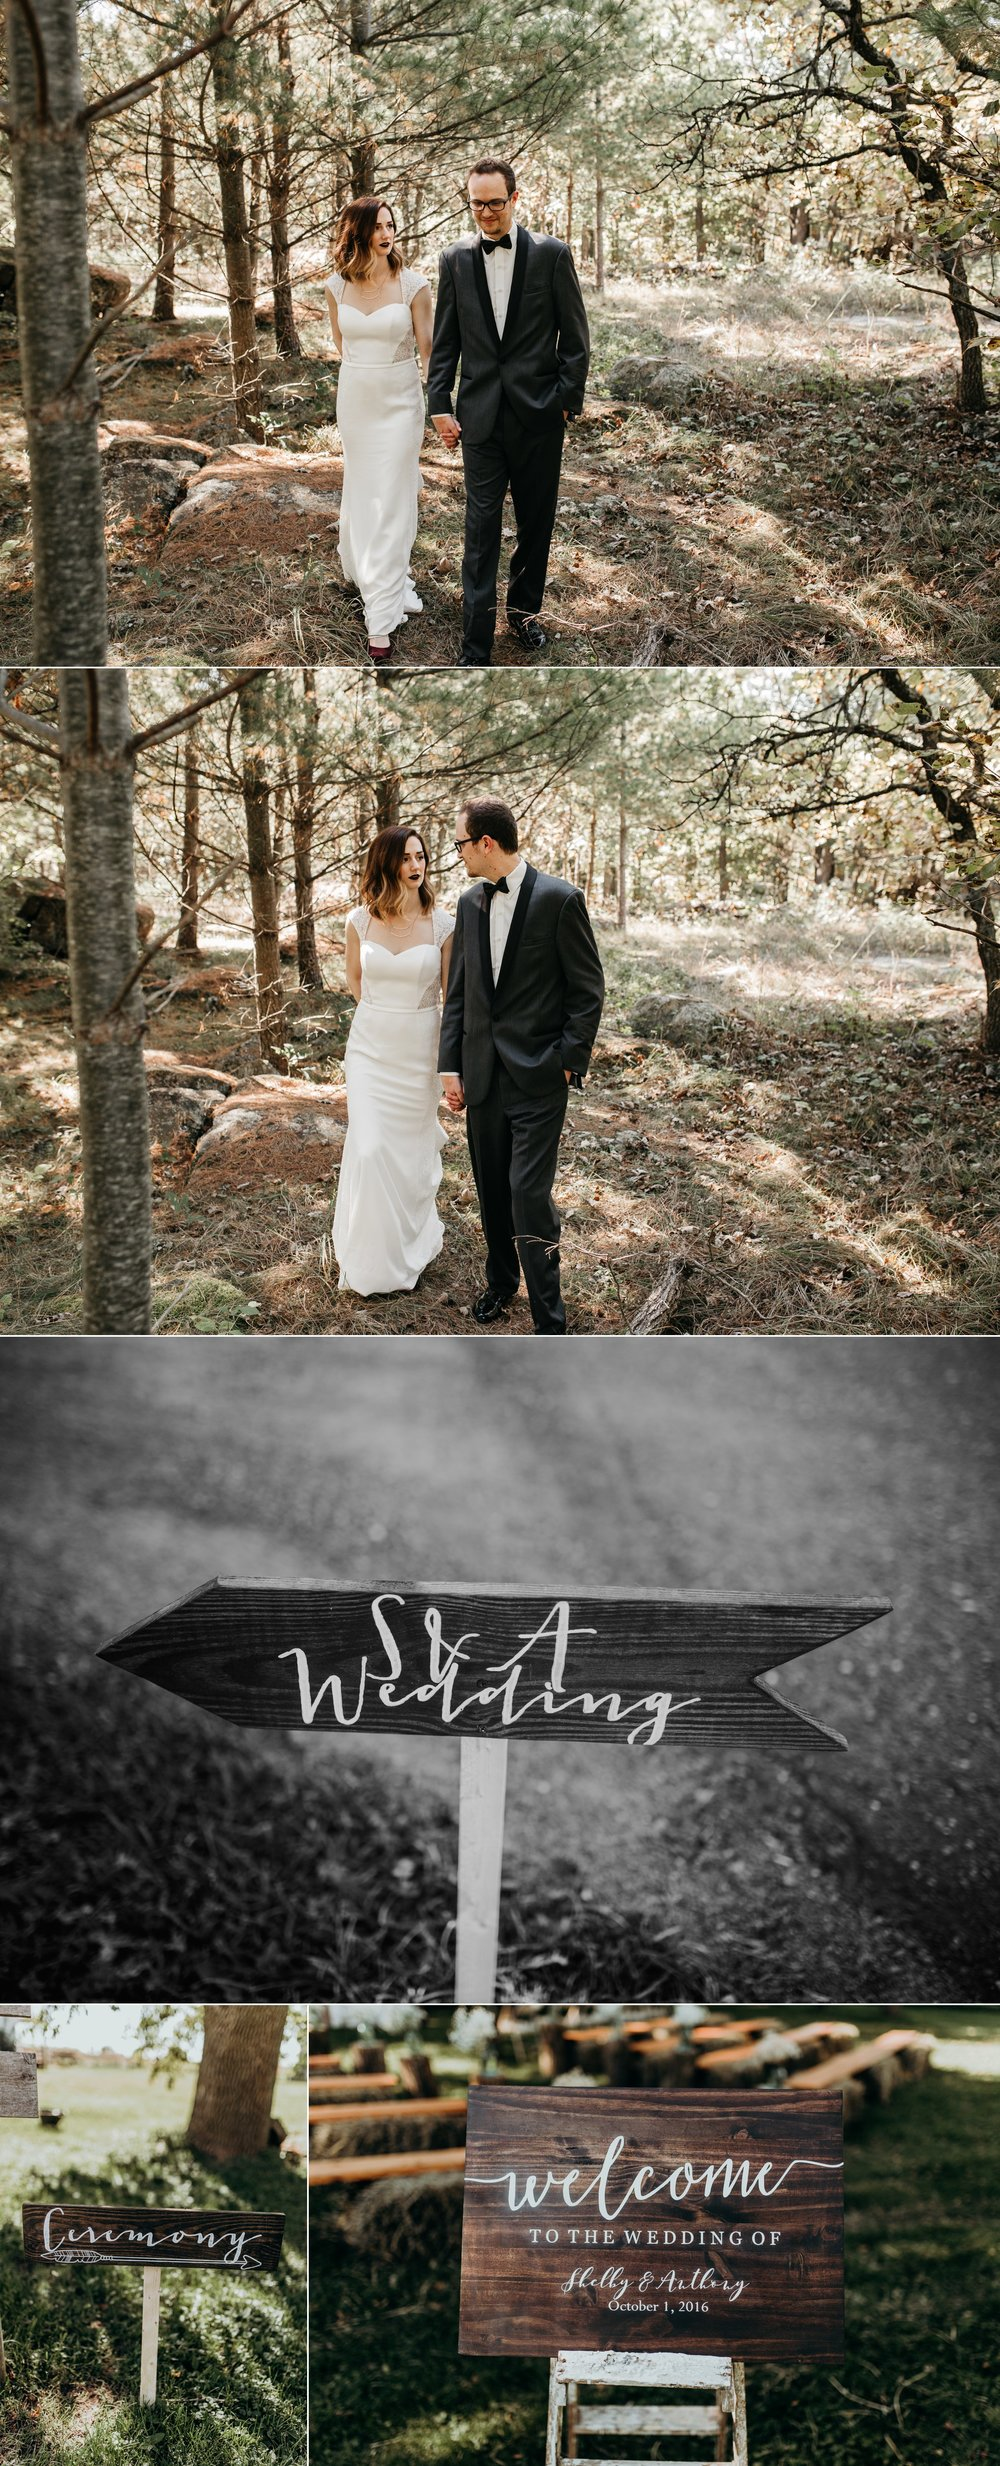 caroline and taylor minneapolis minnesota texas austin dallas houston wedding elopement destination intimate adventurous couple best photographer_0215.jpg